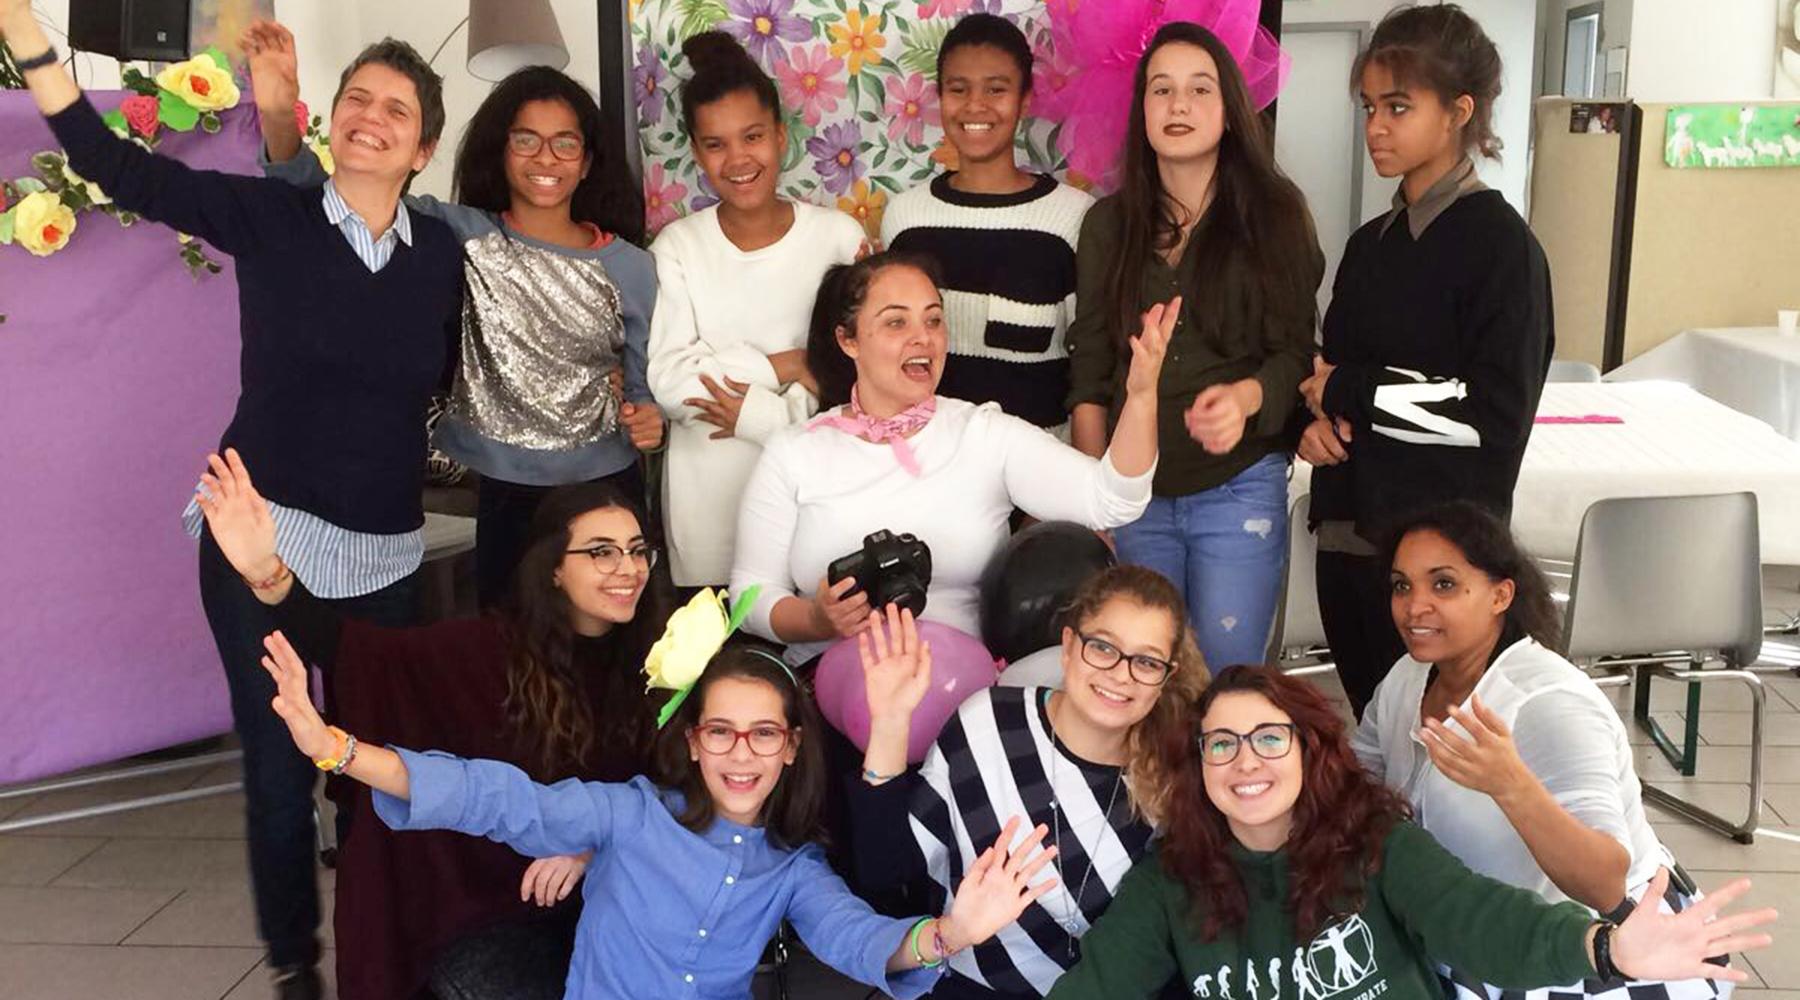 PREMIERE RENCONTRE 'GIRLS4CHRIST' AU TESSIN